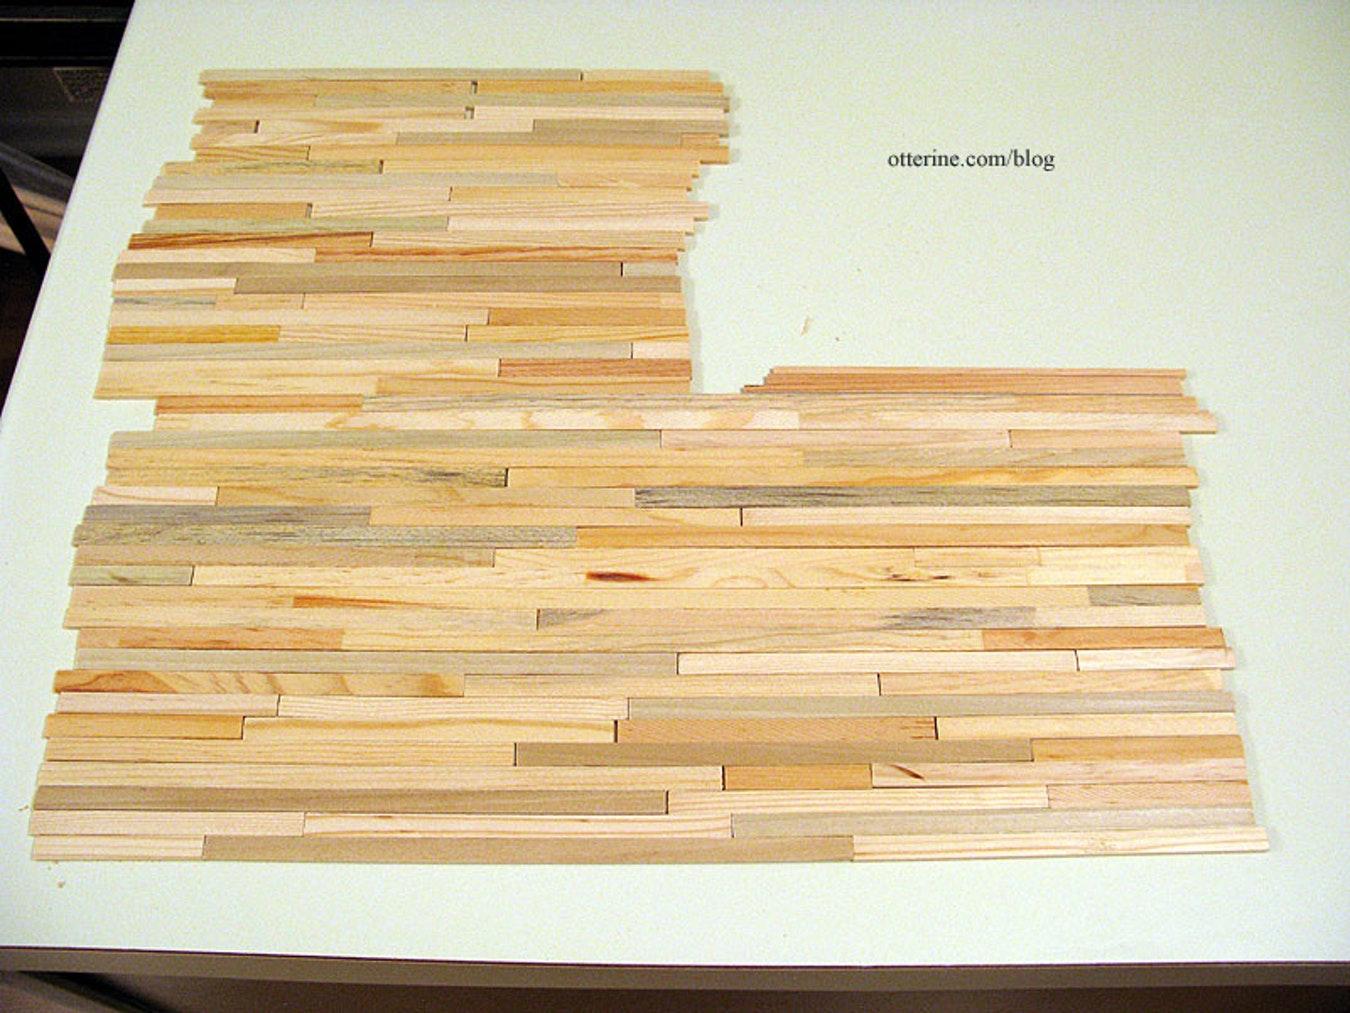 1350x1013 Wood Flooring Drawing 130213 Art Floor01s Enjoyable Depiction